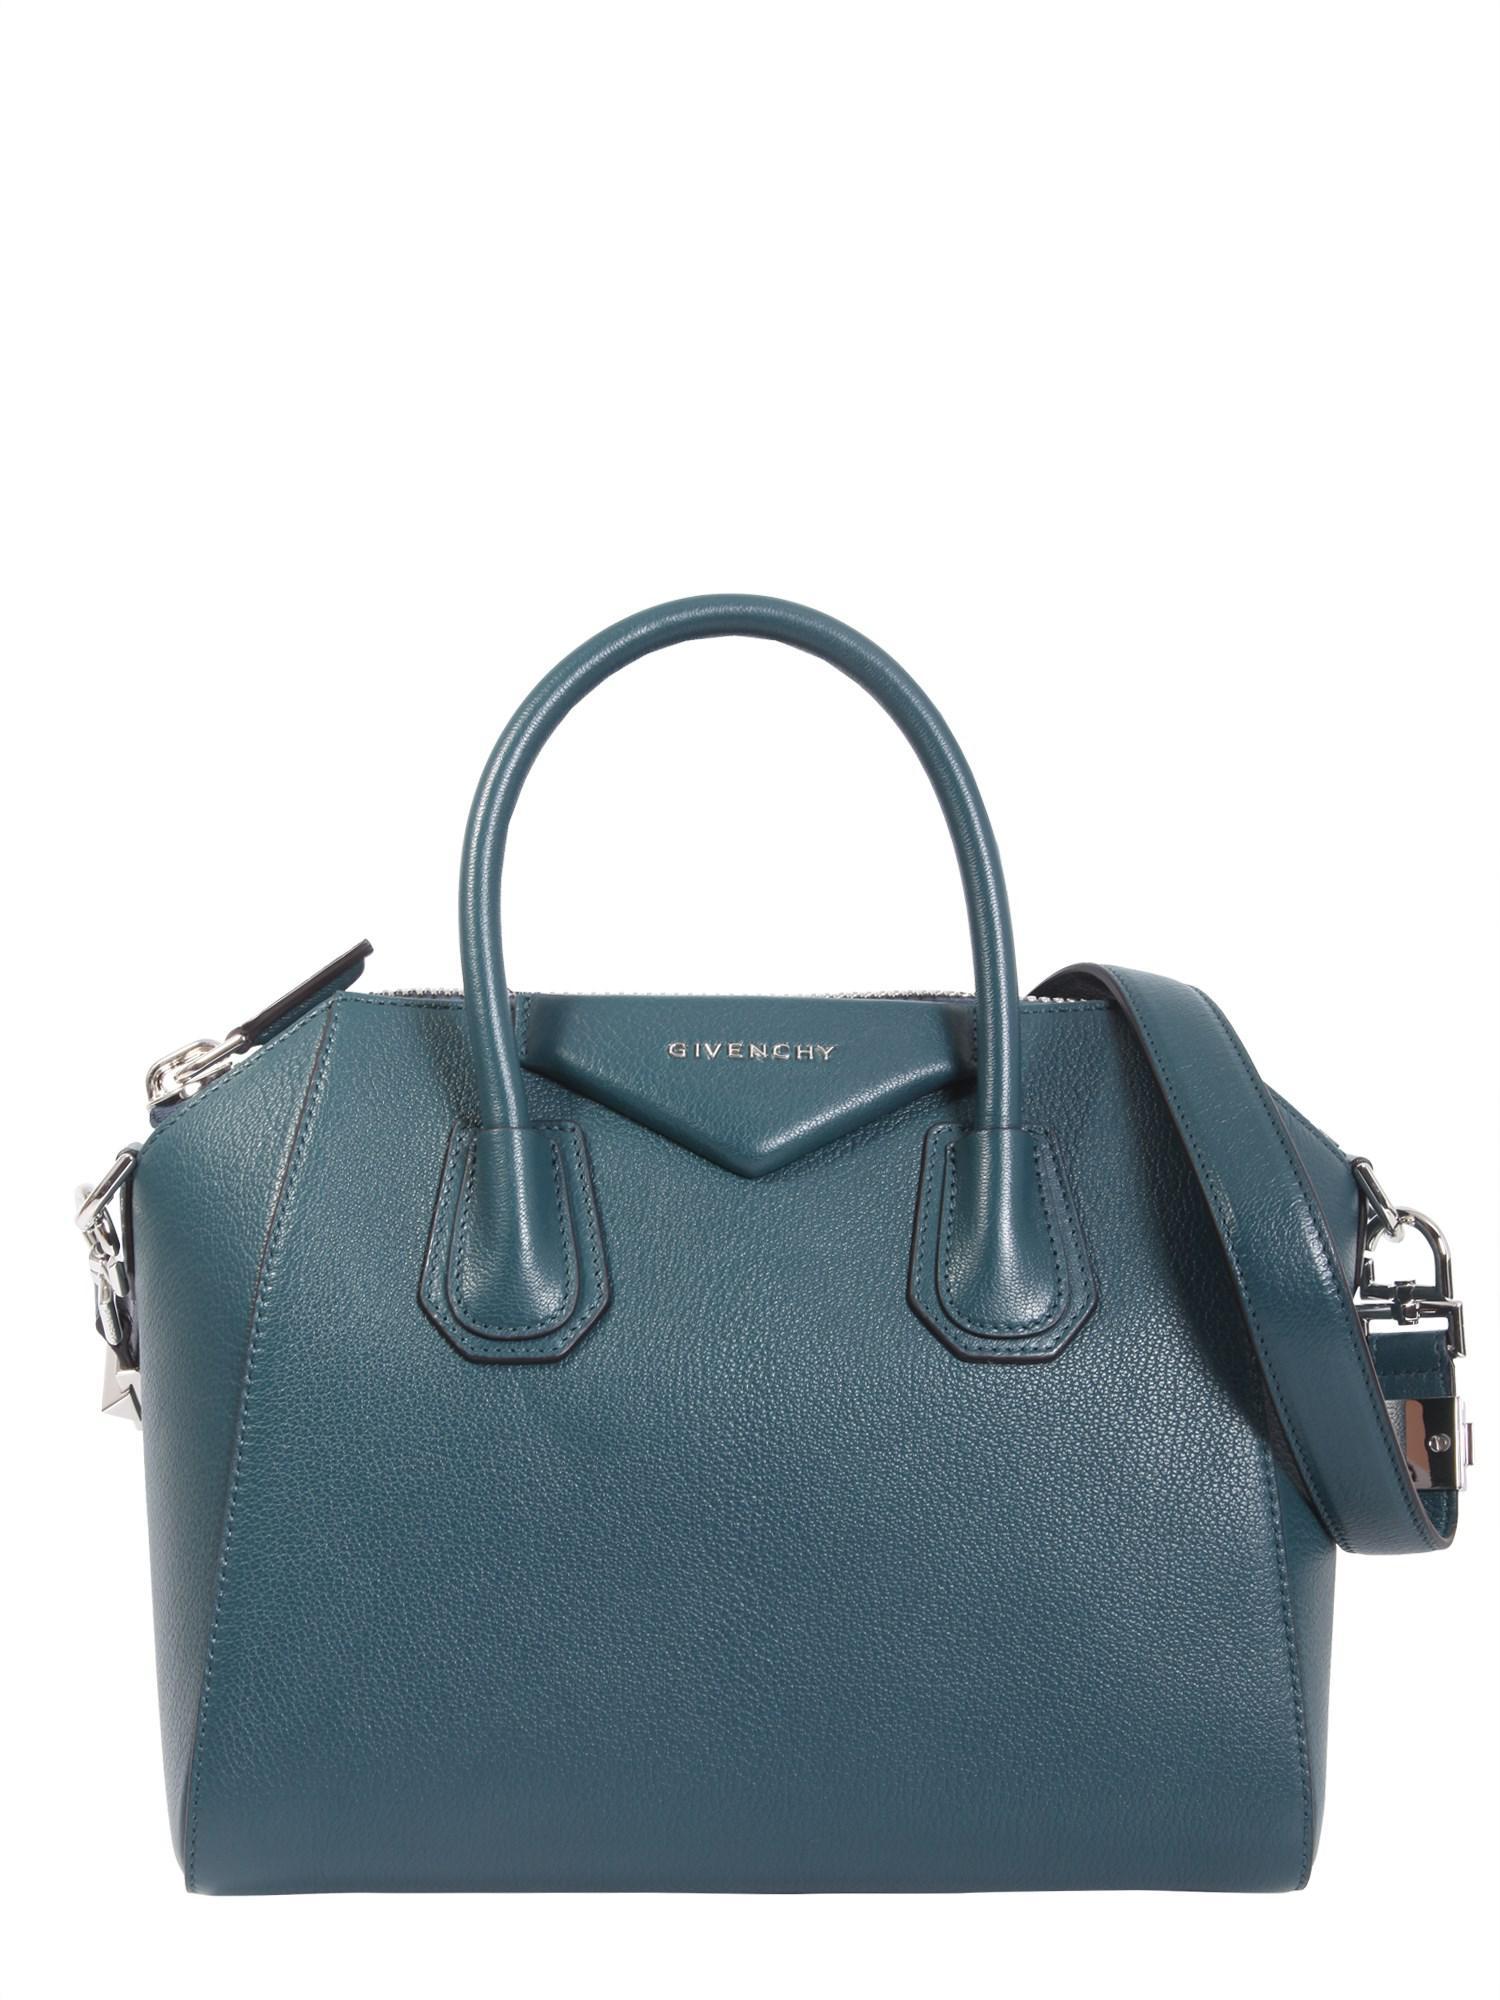 Givenchy - Blue Small Antigona Leather Bag - Lyst. View Fullscreen 5a21ece826